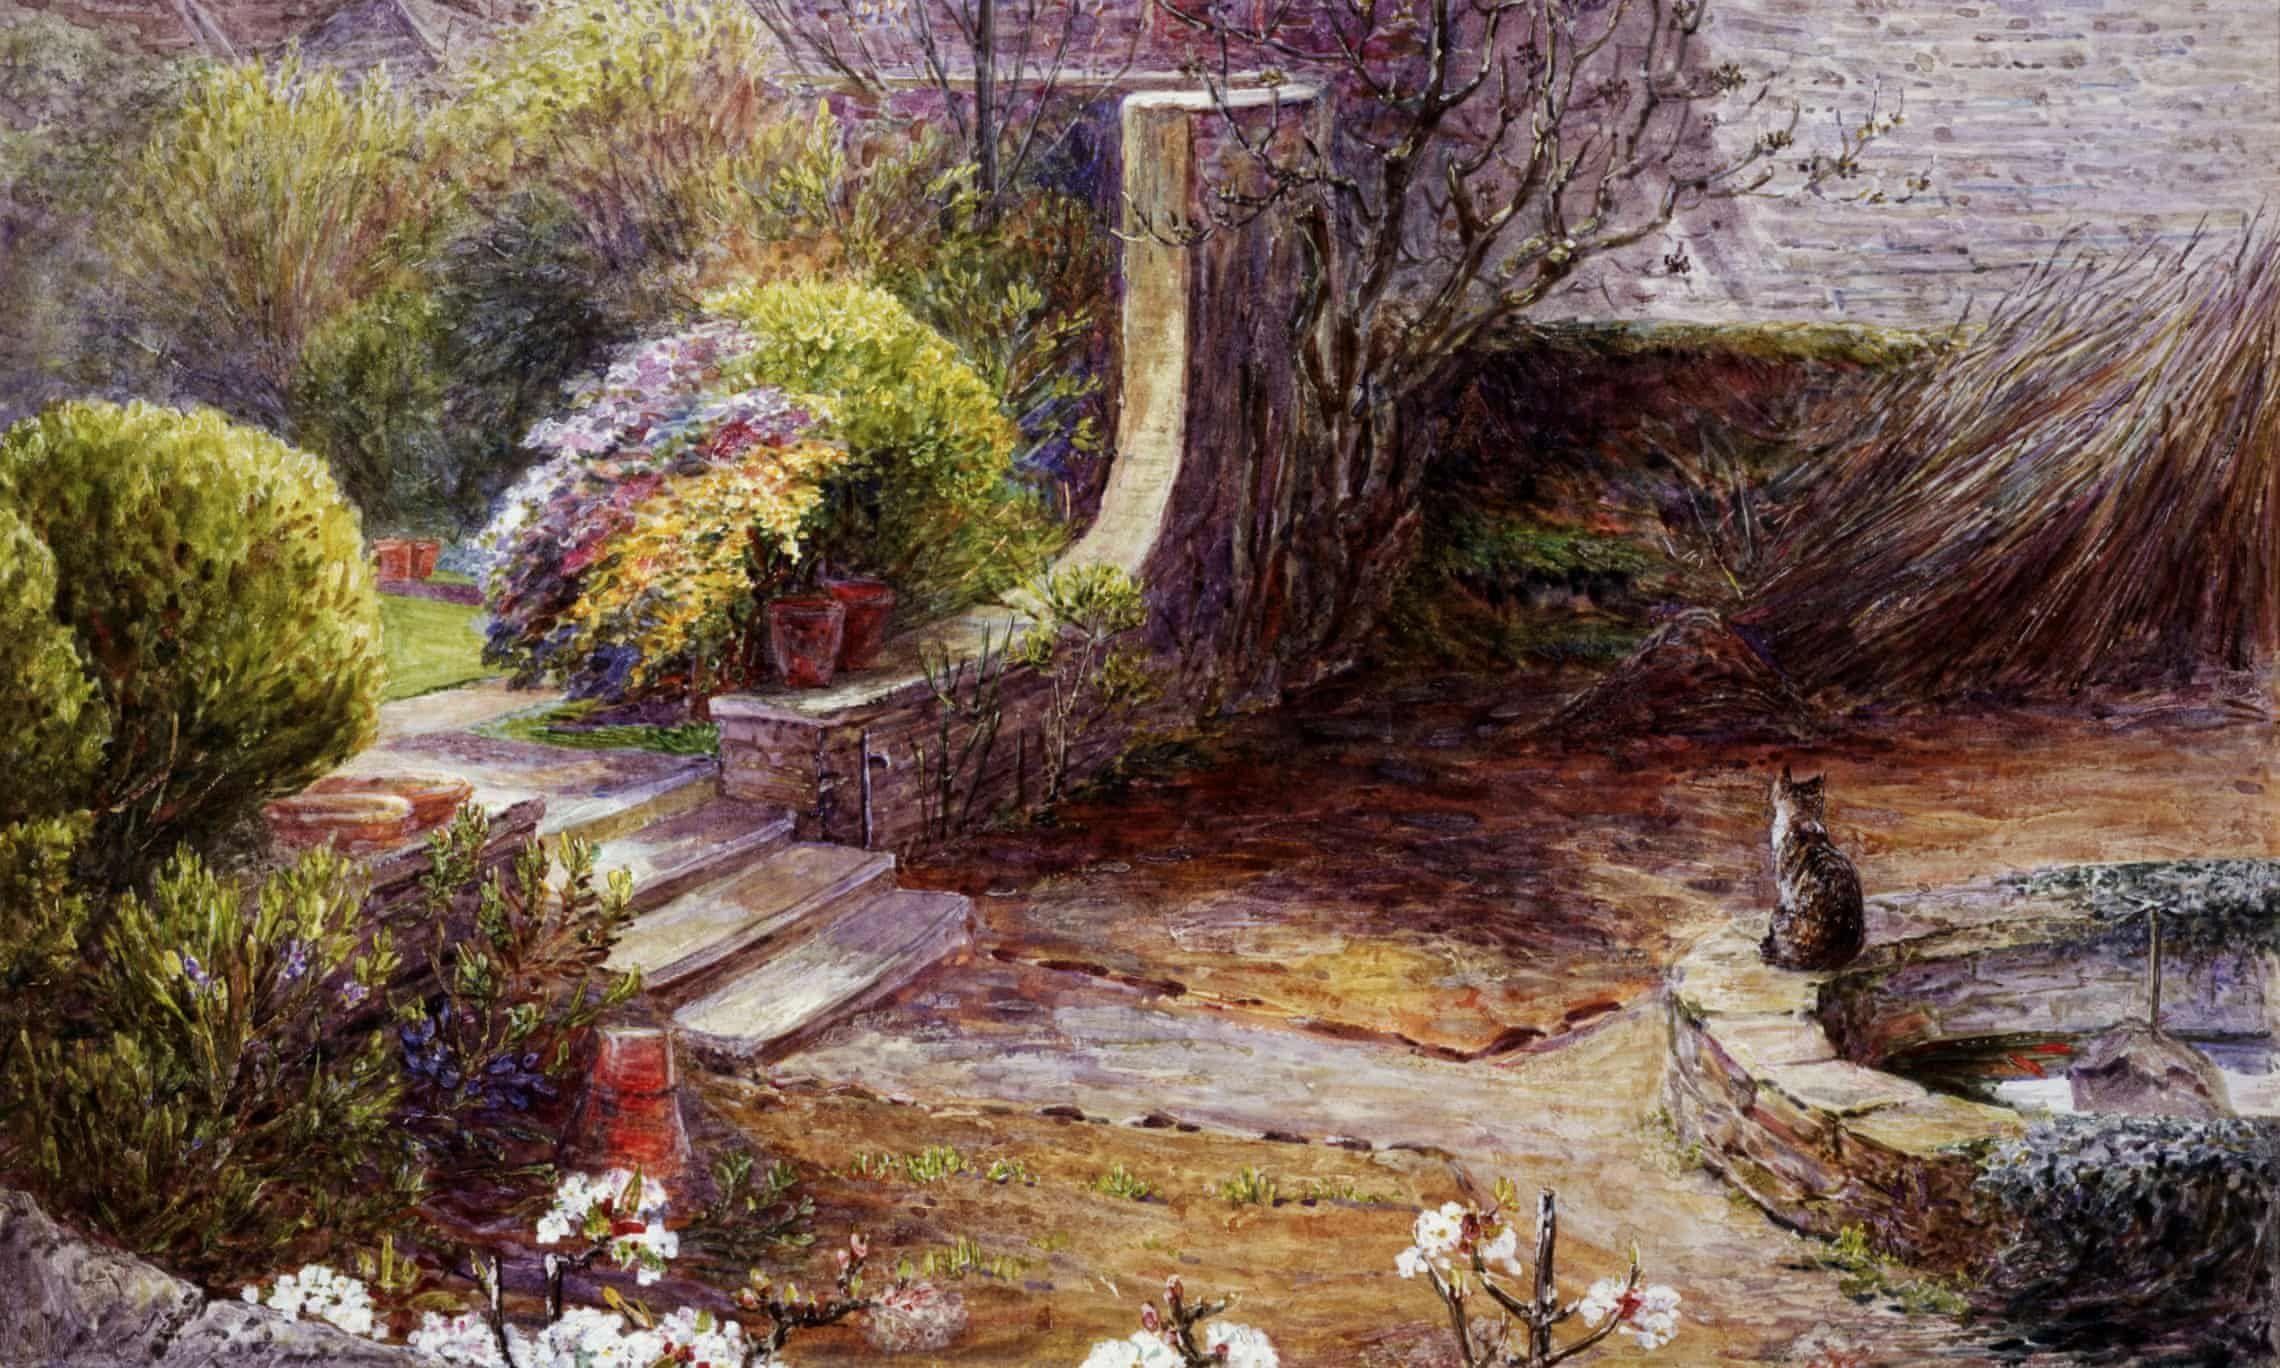 Beatrix potters landscape inspirations in pictures